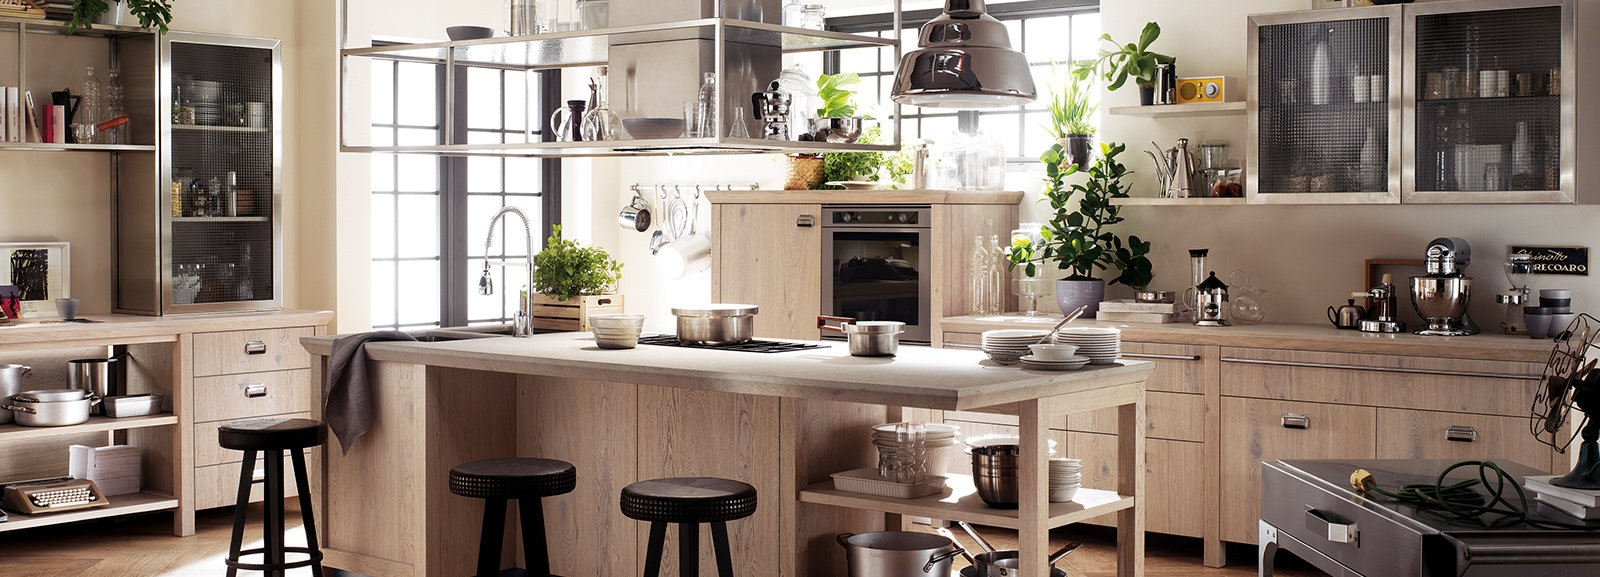 cucine in acciaio usate ~ duylinh for . - Cucina Moderna Usata